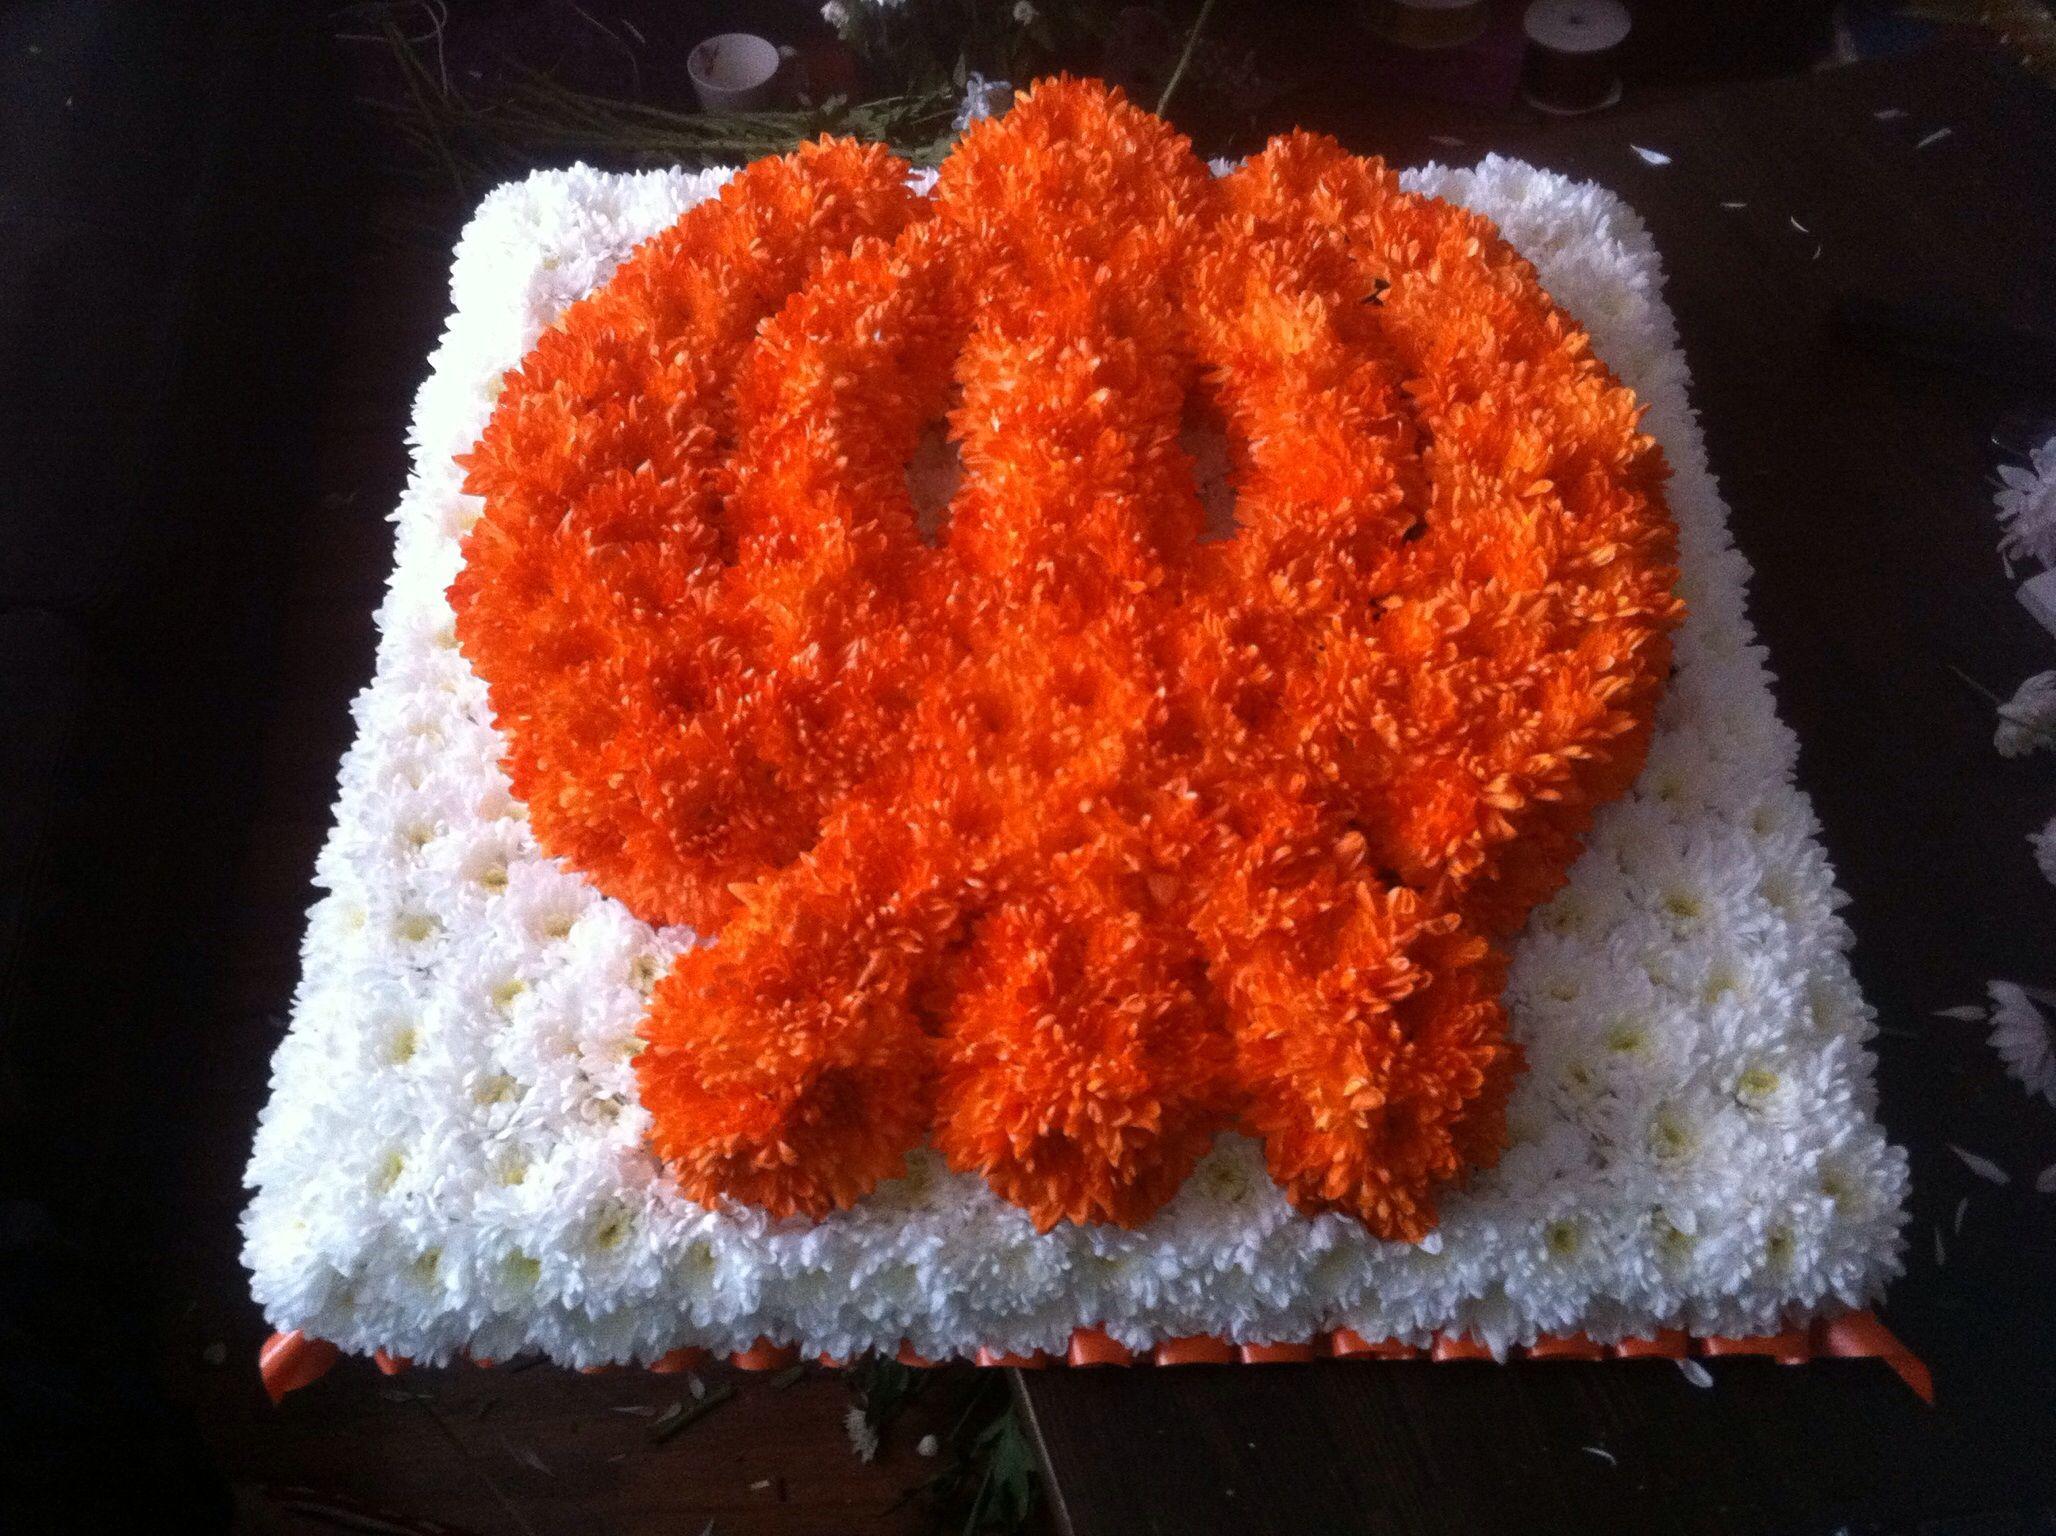 Khanda sikh pinterest funeral flowers funeral flowers izmirmasajfo